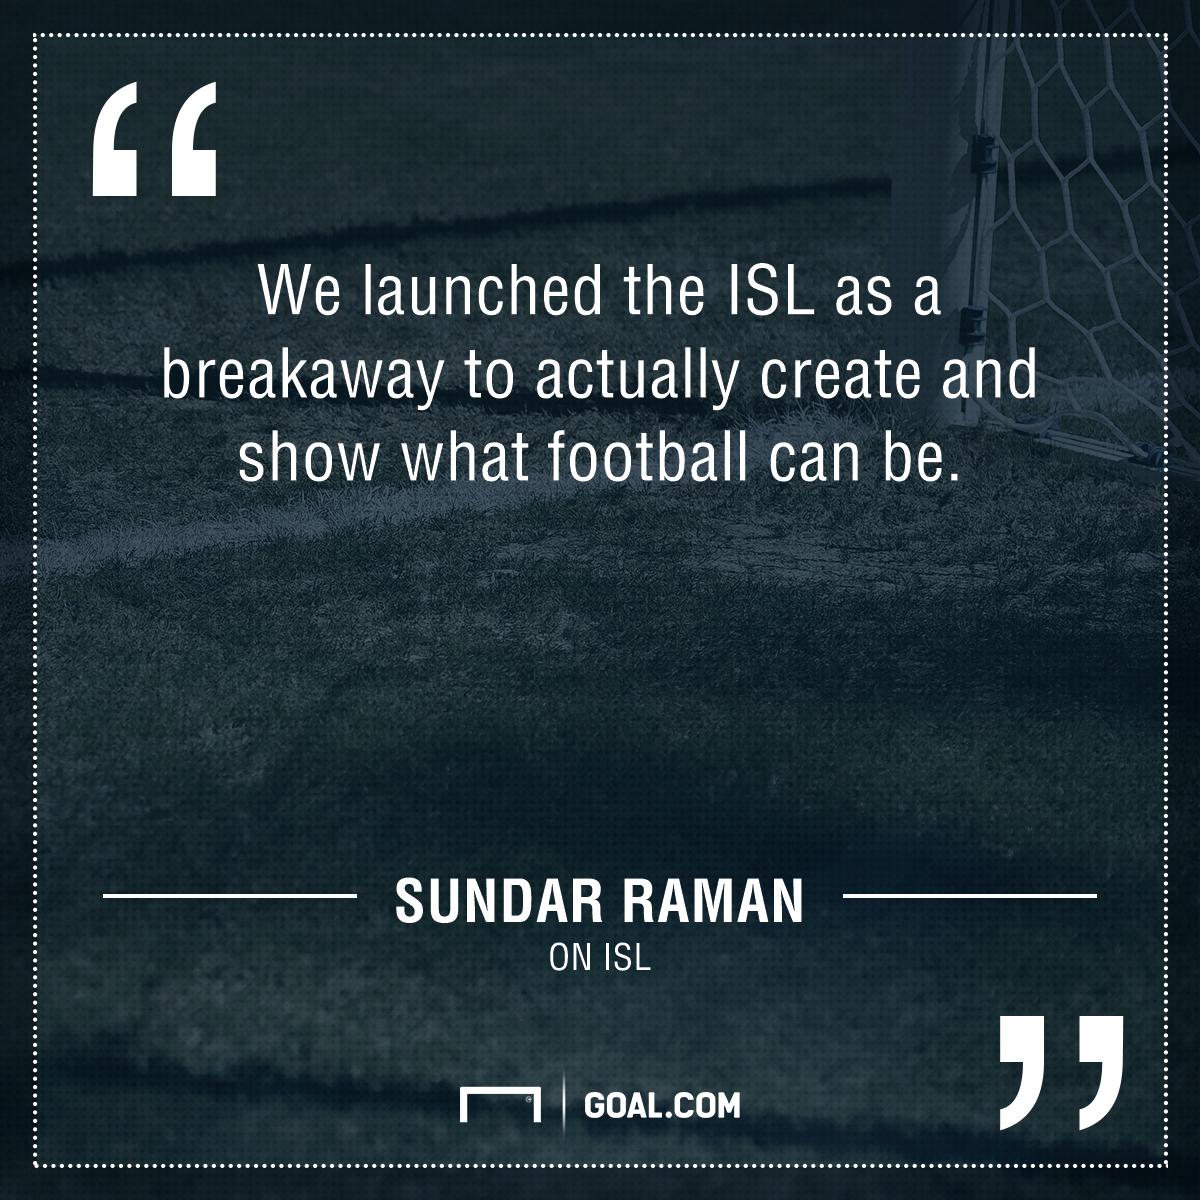 Sundar Raman on ISL